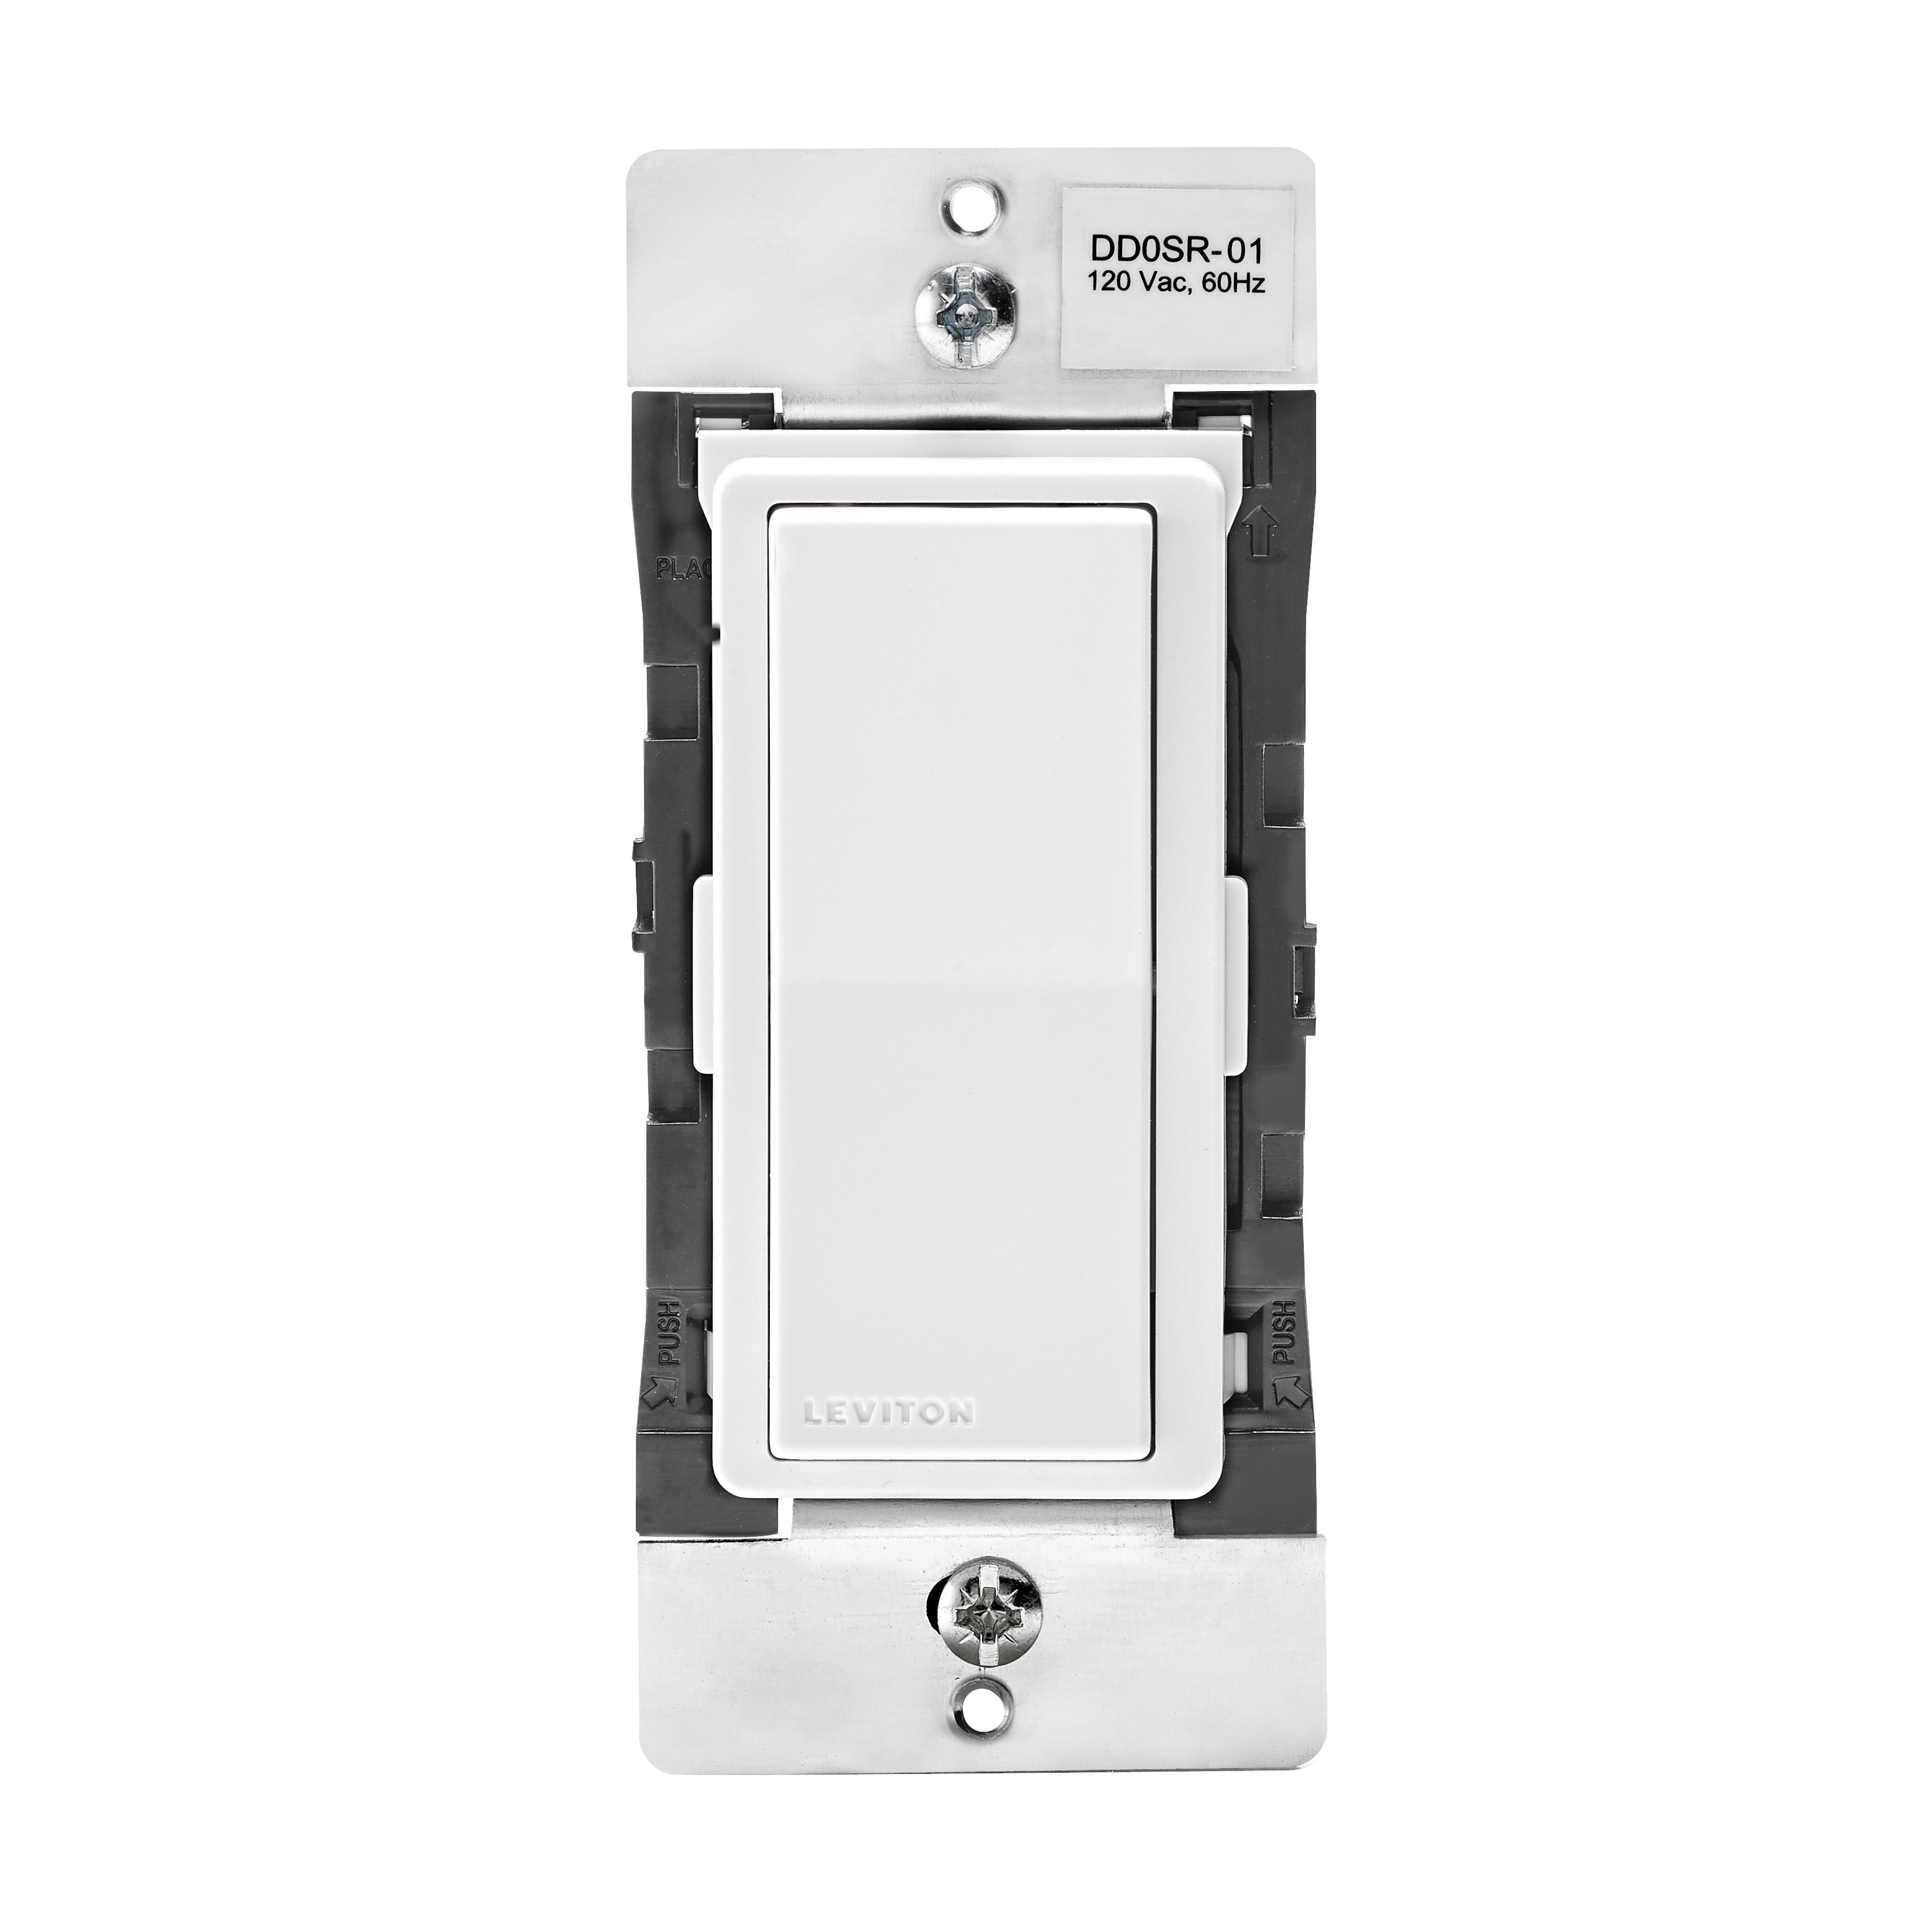 Picture of Leviton R01-DD0SR-01M Switch Remote Dimmer, 3-Way, 120/277 VAC, 60 Hz, Bluetooth, Hardwired